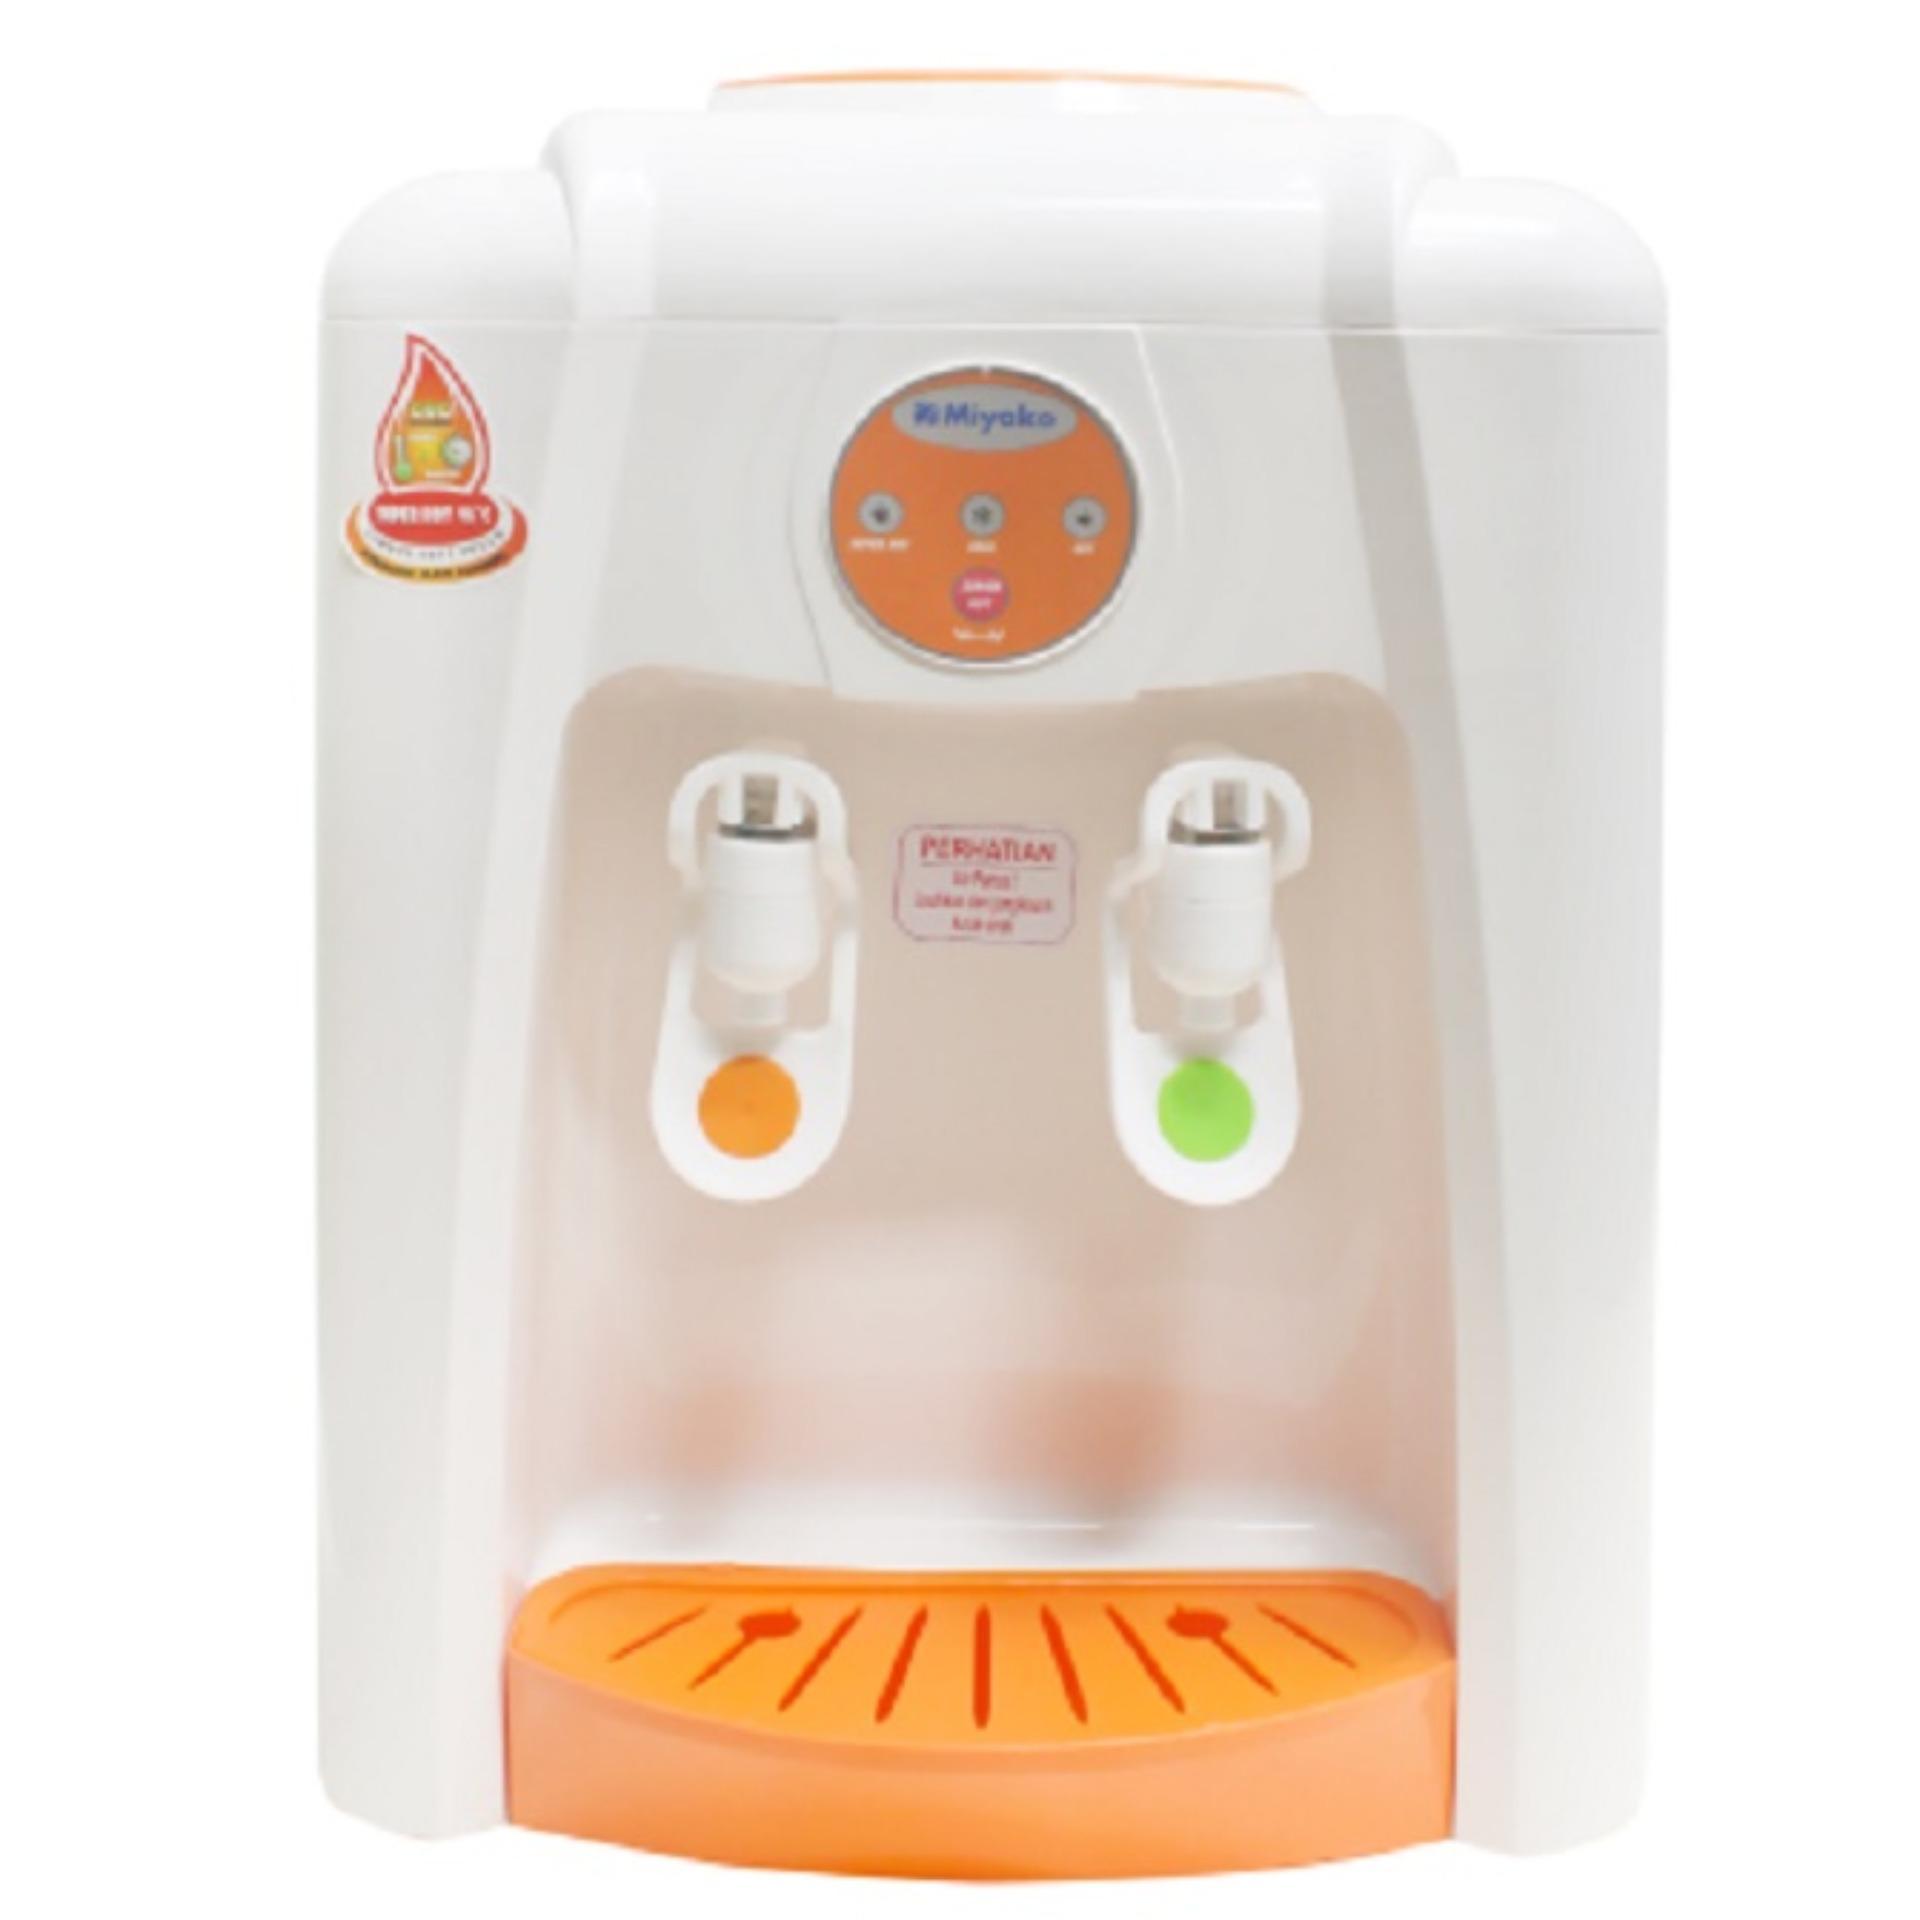 Miyako Dispenser Isian Bawah Wdp300